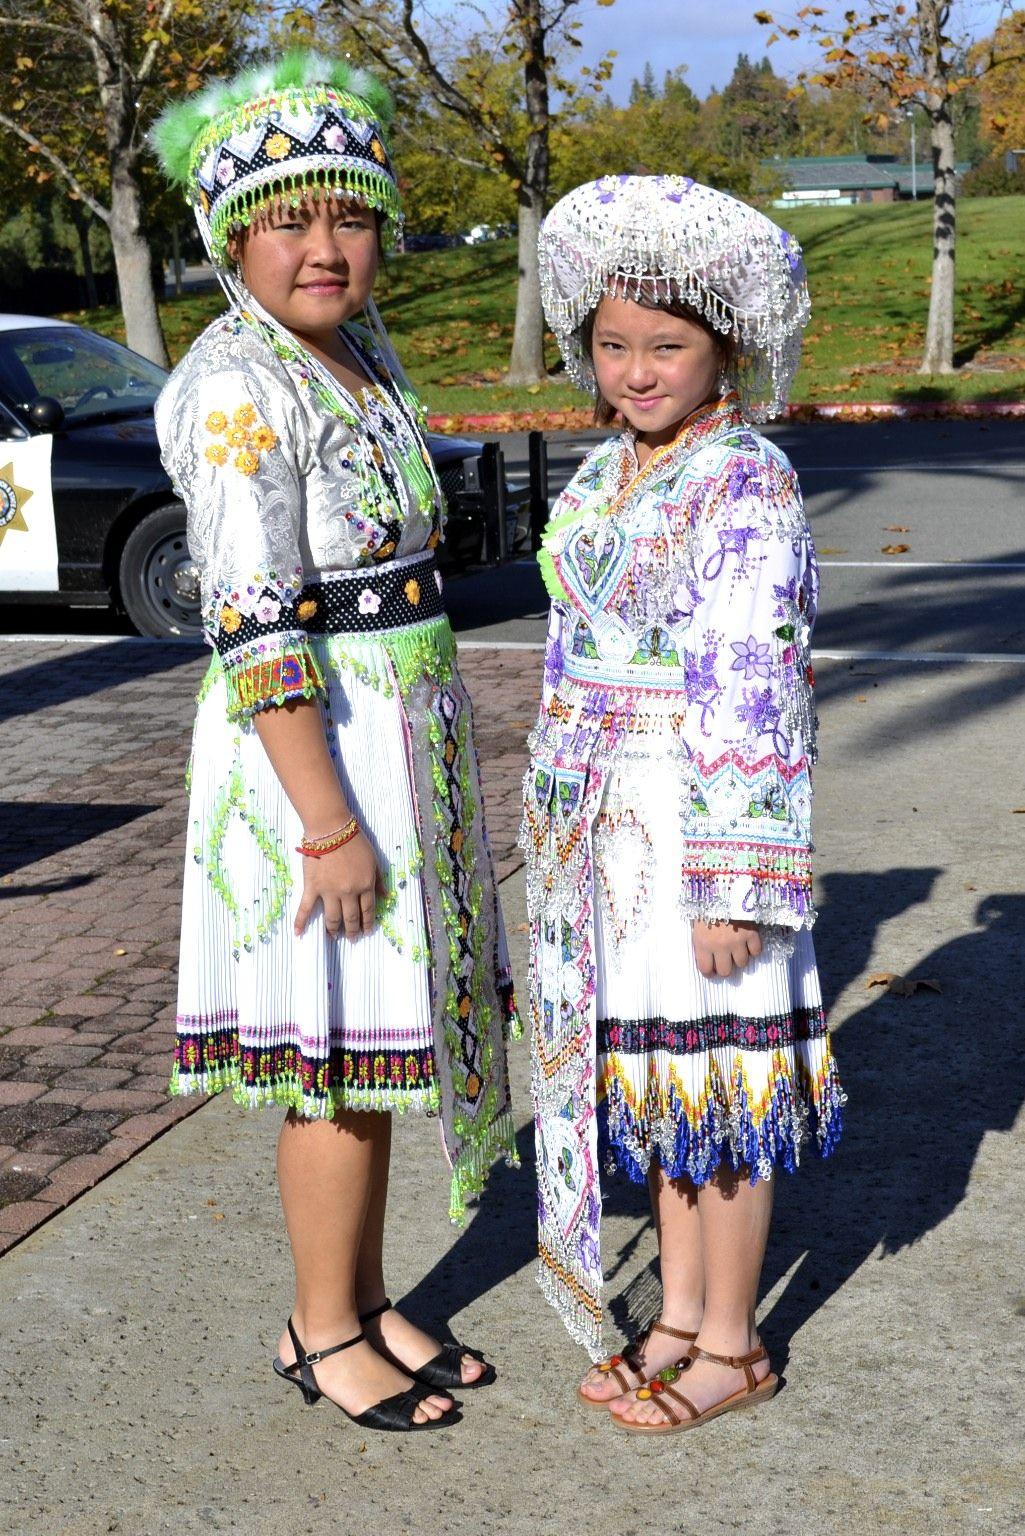 Hmong New Year brings thousands to Cal Expo - Sacramento Press